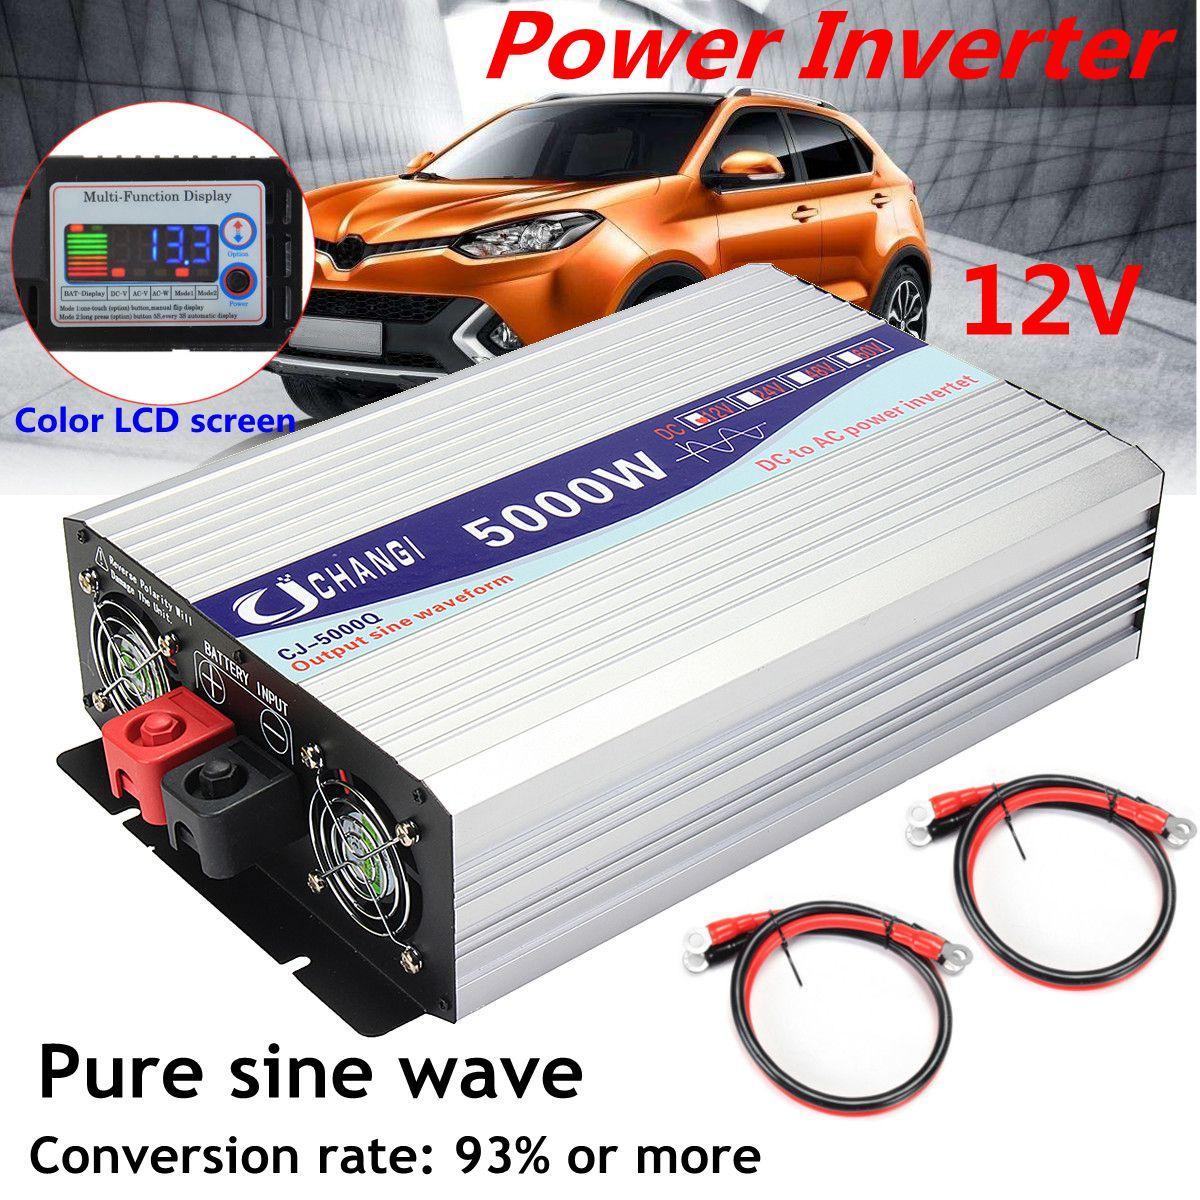 Solar Inverter 12V/24V 110V 6000W/5000W/4000W/3000W Voltage Converter Transformer Pure Sine Wave Inverter 12V/24V 110V InversorSolar Inverter 12V/24V 110V 6000W/5000W/4000W/3000W Voltage Converter Transformer Pure Sine Wave Inverter 12V/24V 110V Inversor